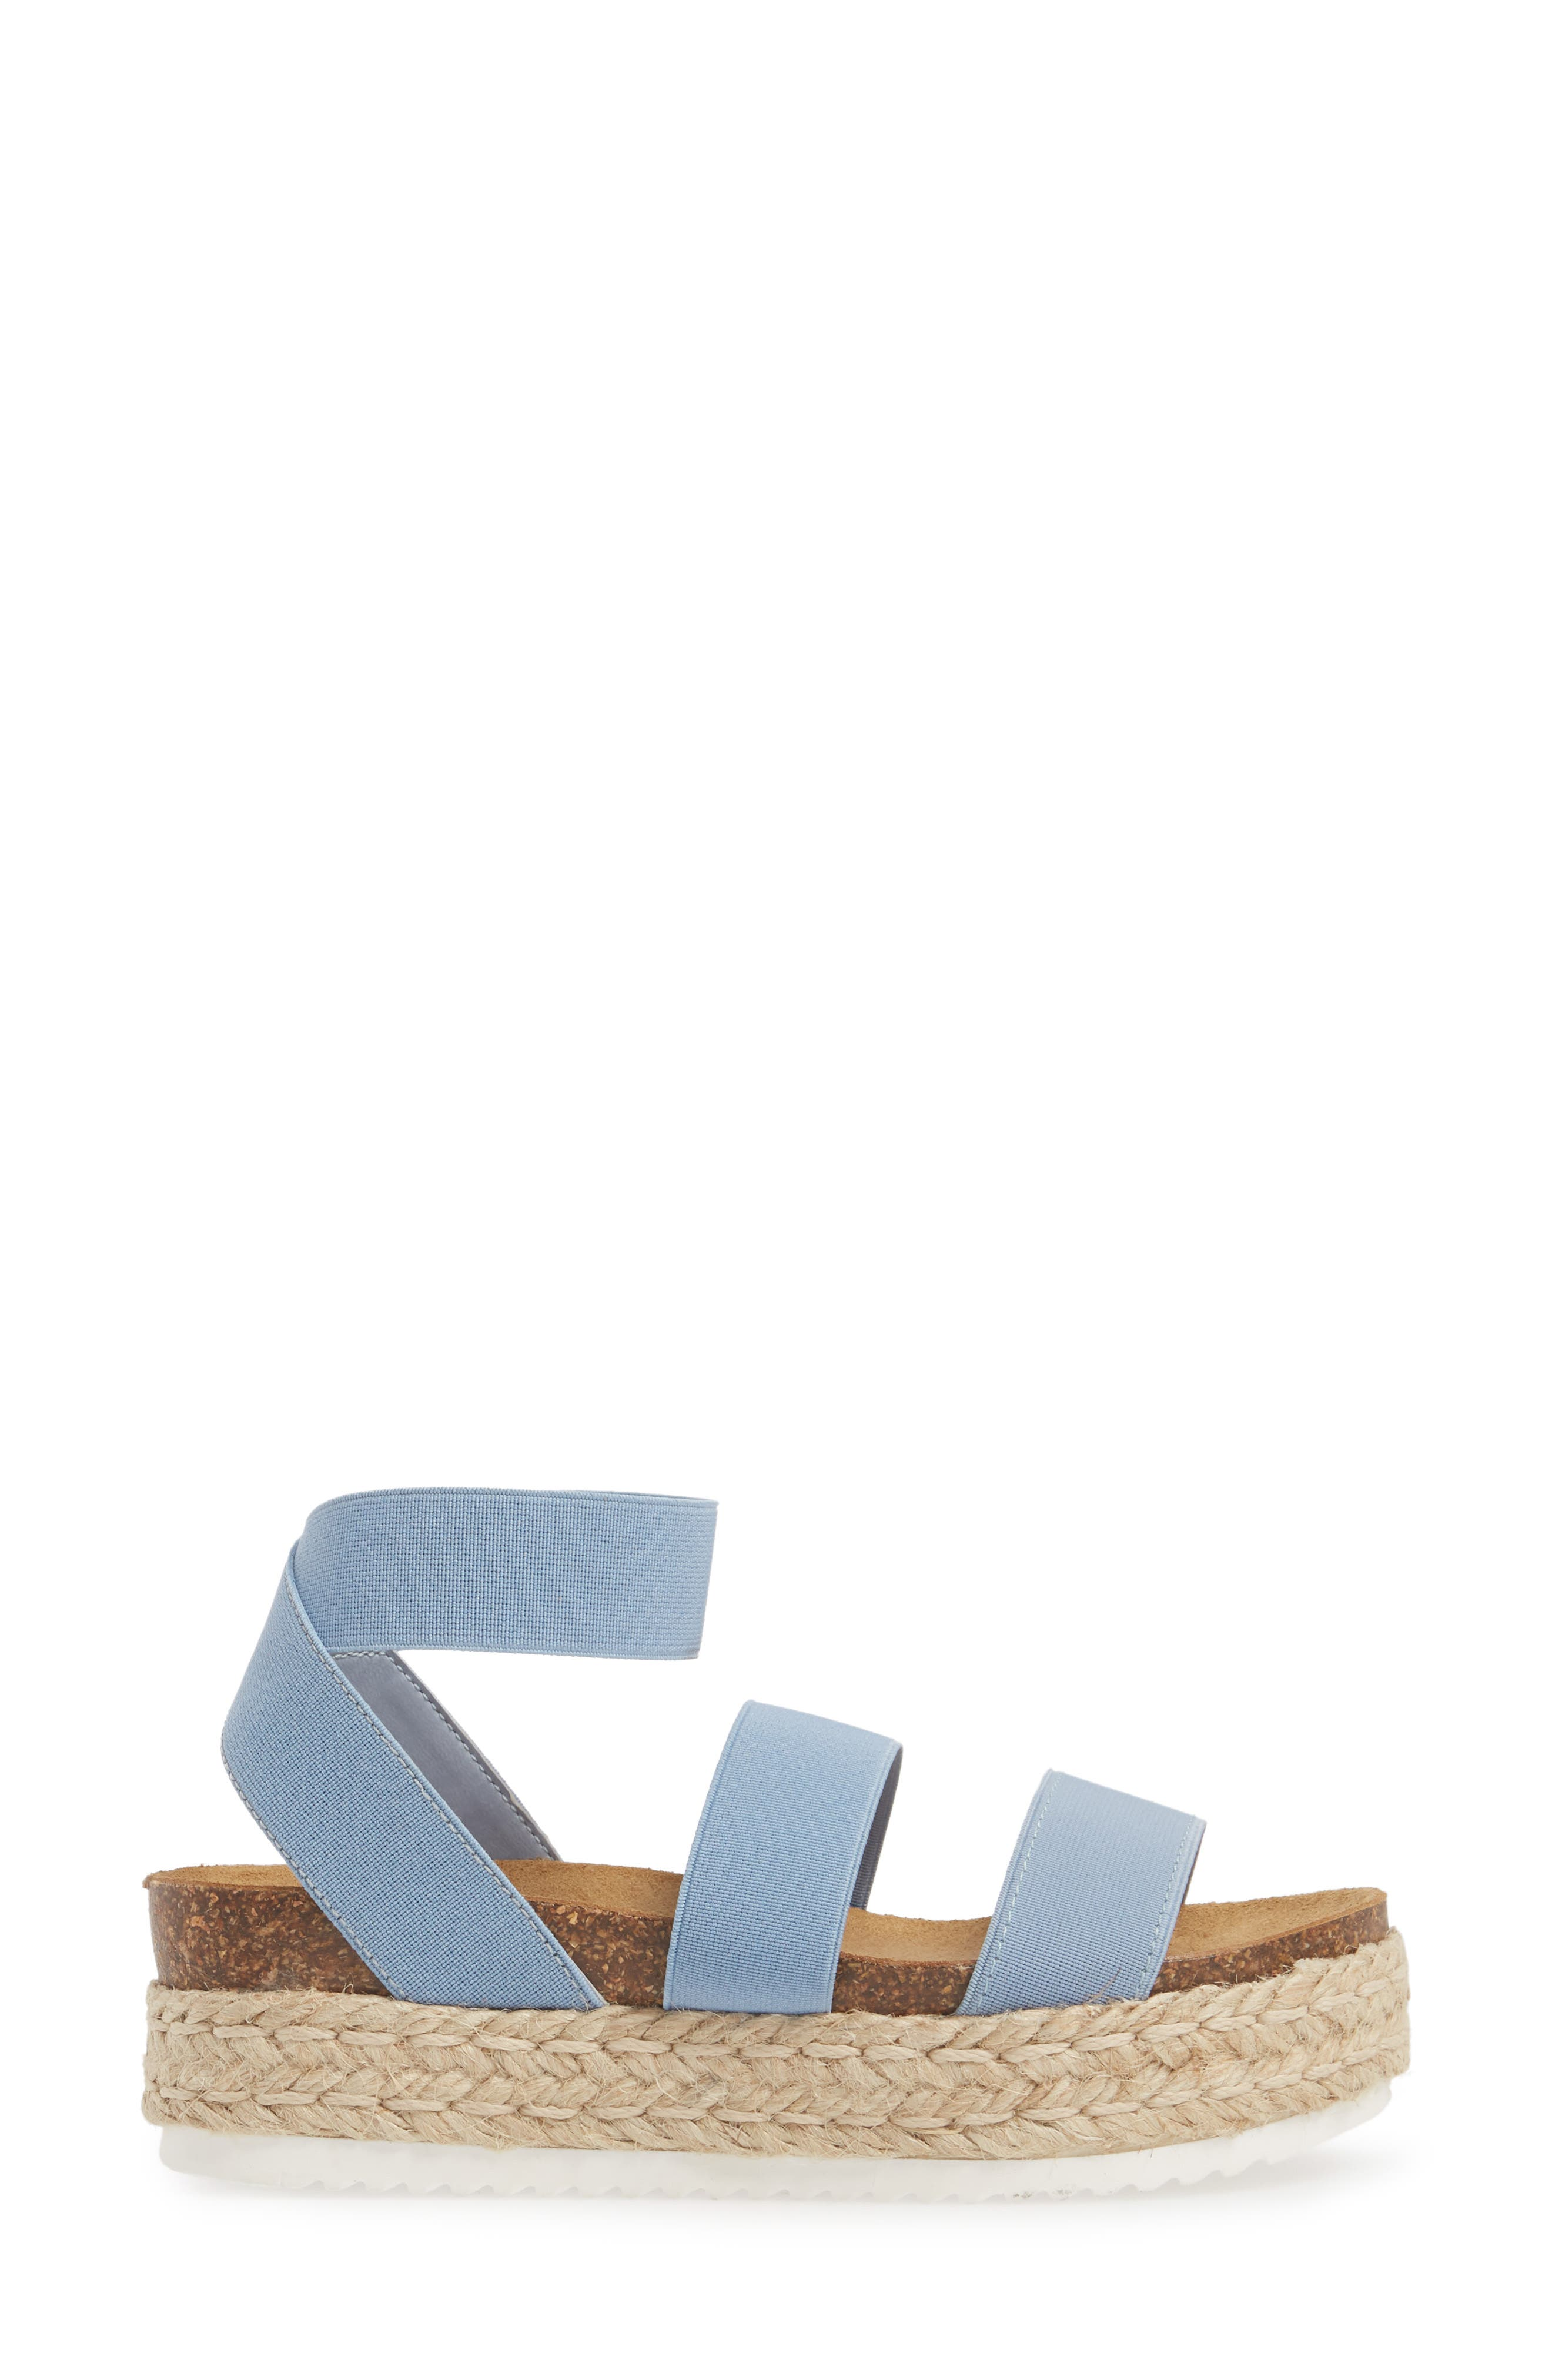 Kimmie Flatform Sandal,                             Alternate thumbnail 8, color,